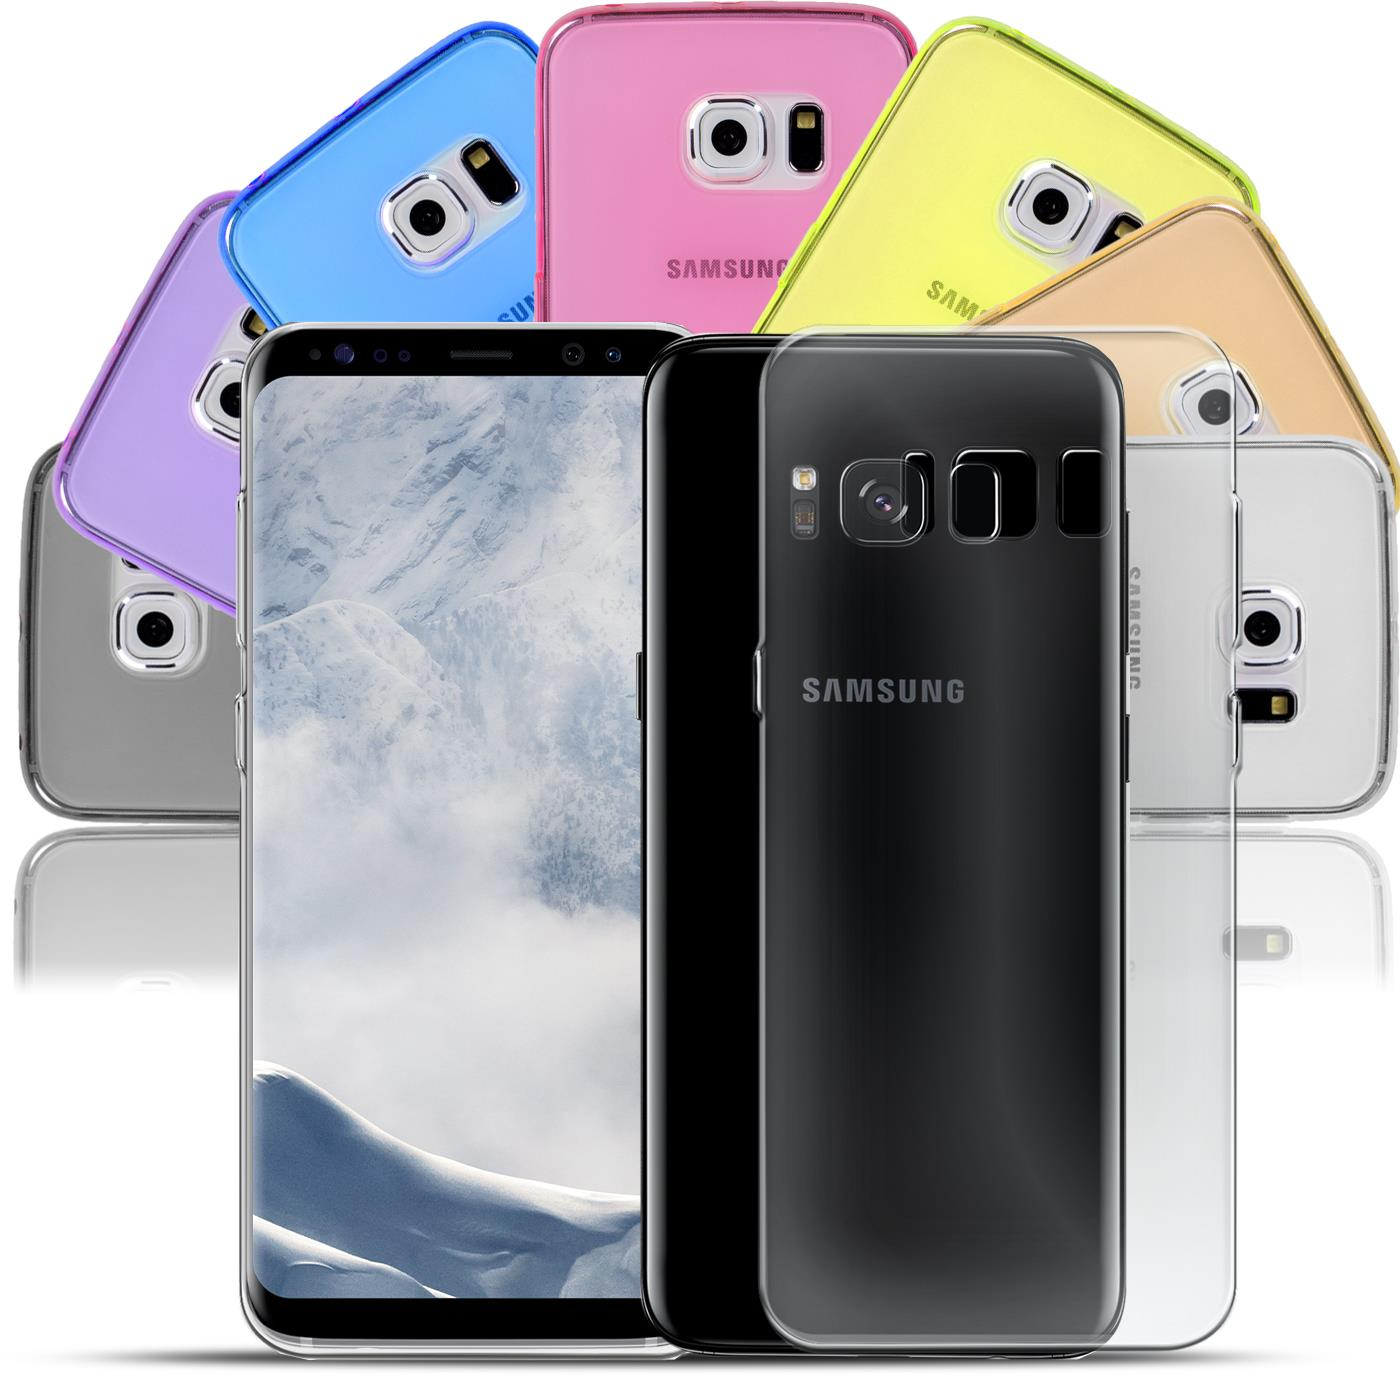 Samsung-Galaxy-s8-Duenn-Silikon-Klar-Case-Cover-Ultra-Slim-Stossfeste-Gel-Rueckseite